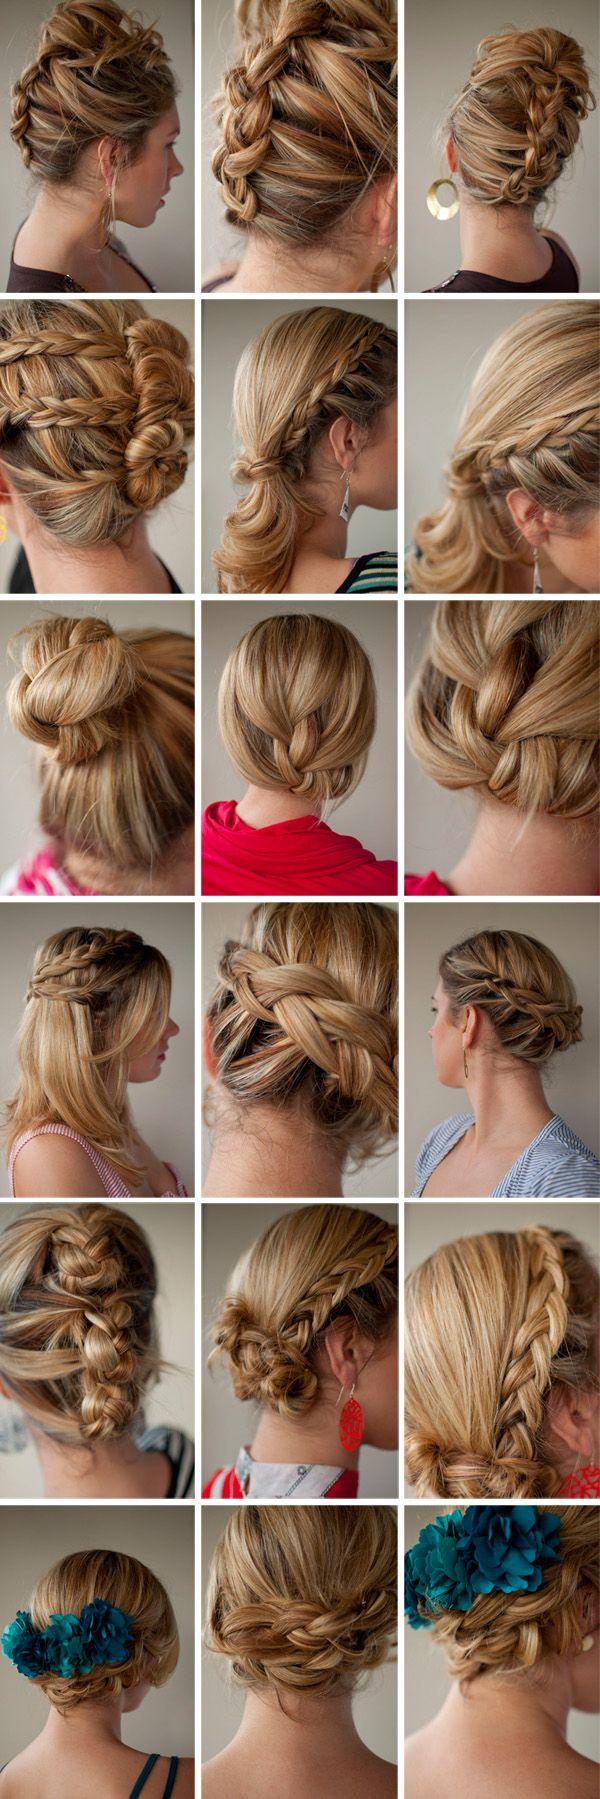 Волосся середньої довжини